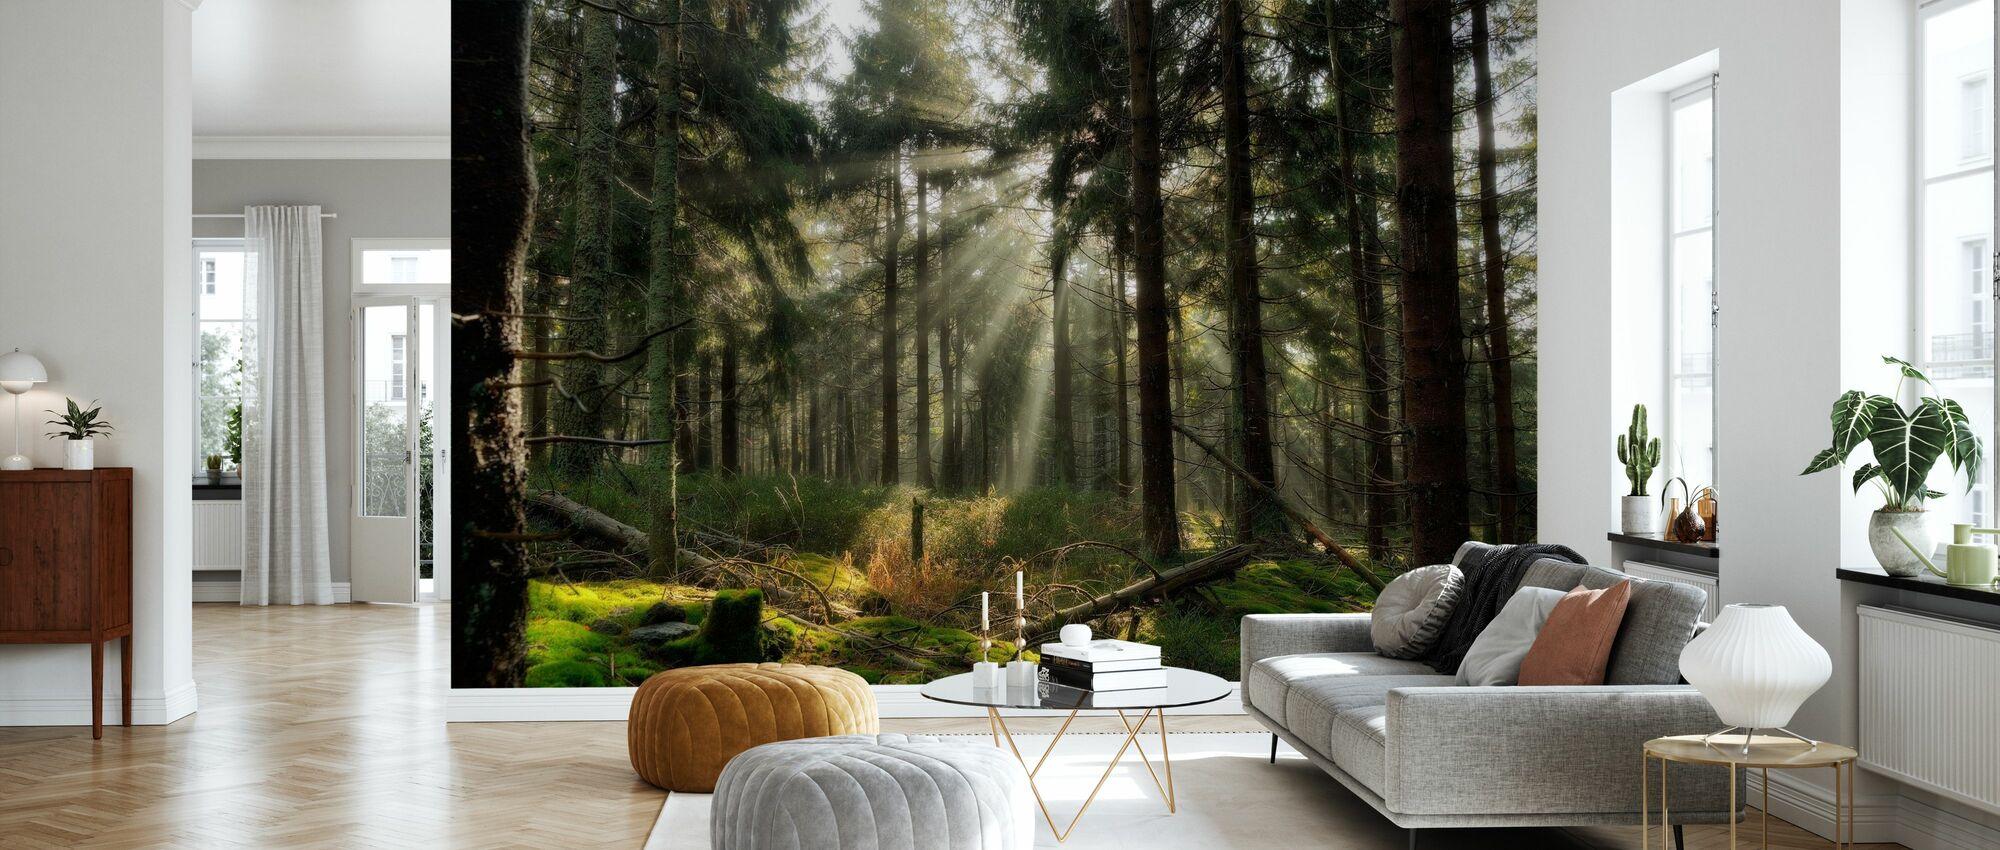 Sunbeam in the Forest - Wallpaper - Living Room